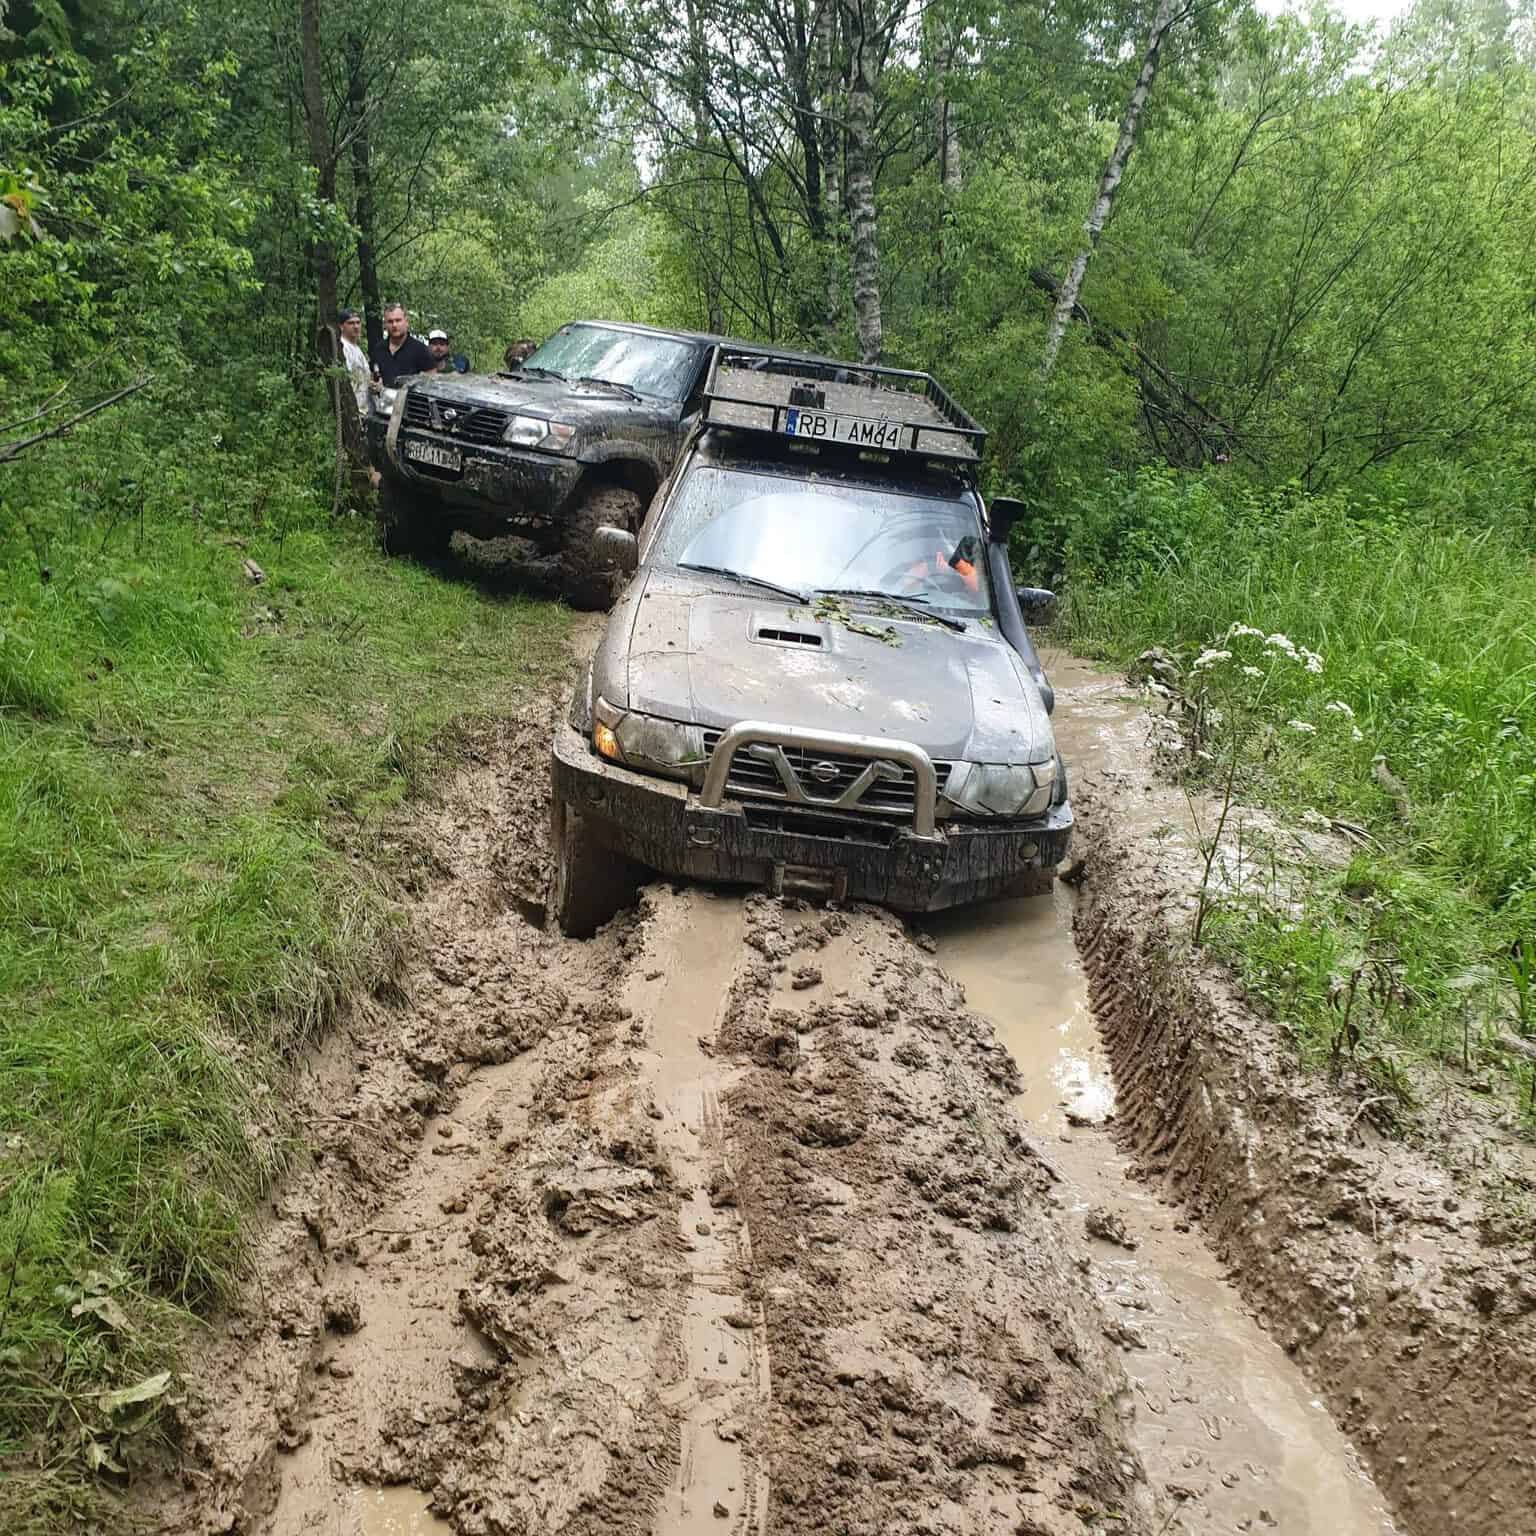 samochody terenowe na błotnistej drodze leśnej